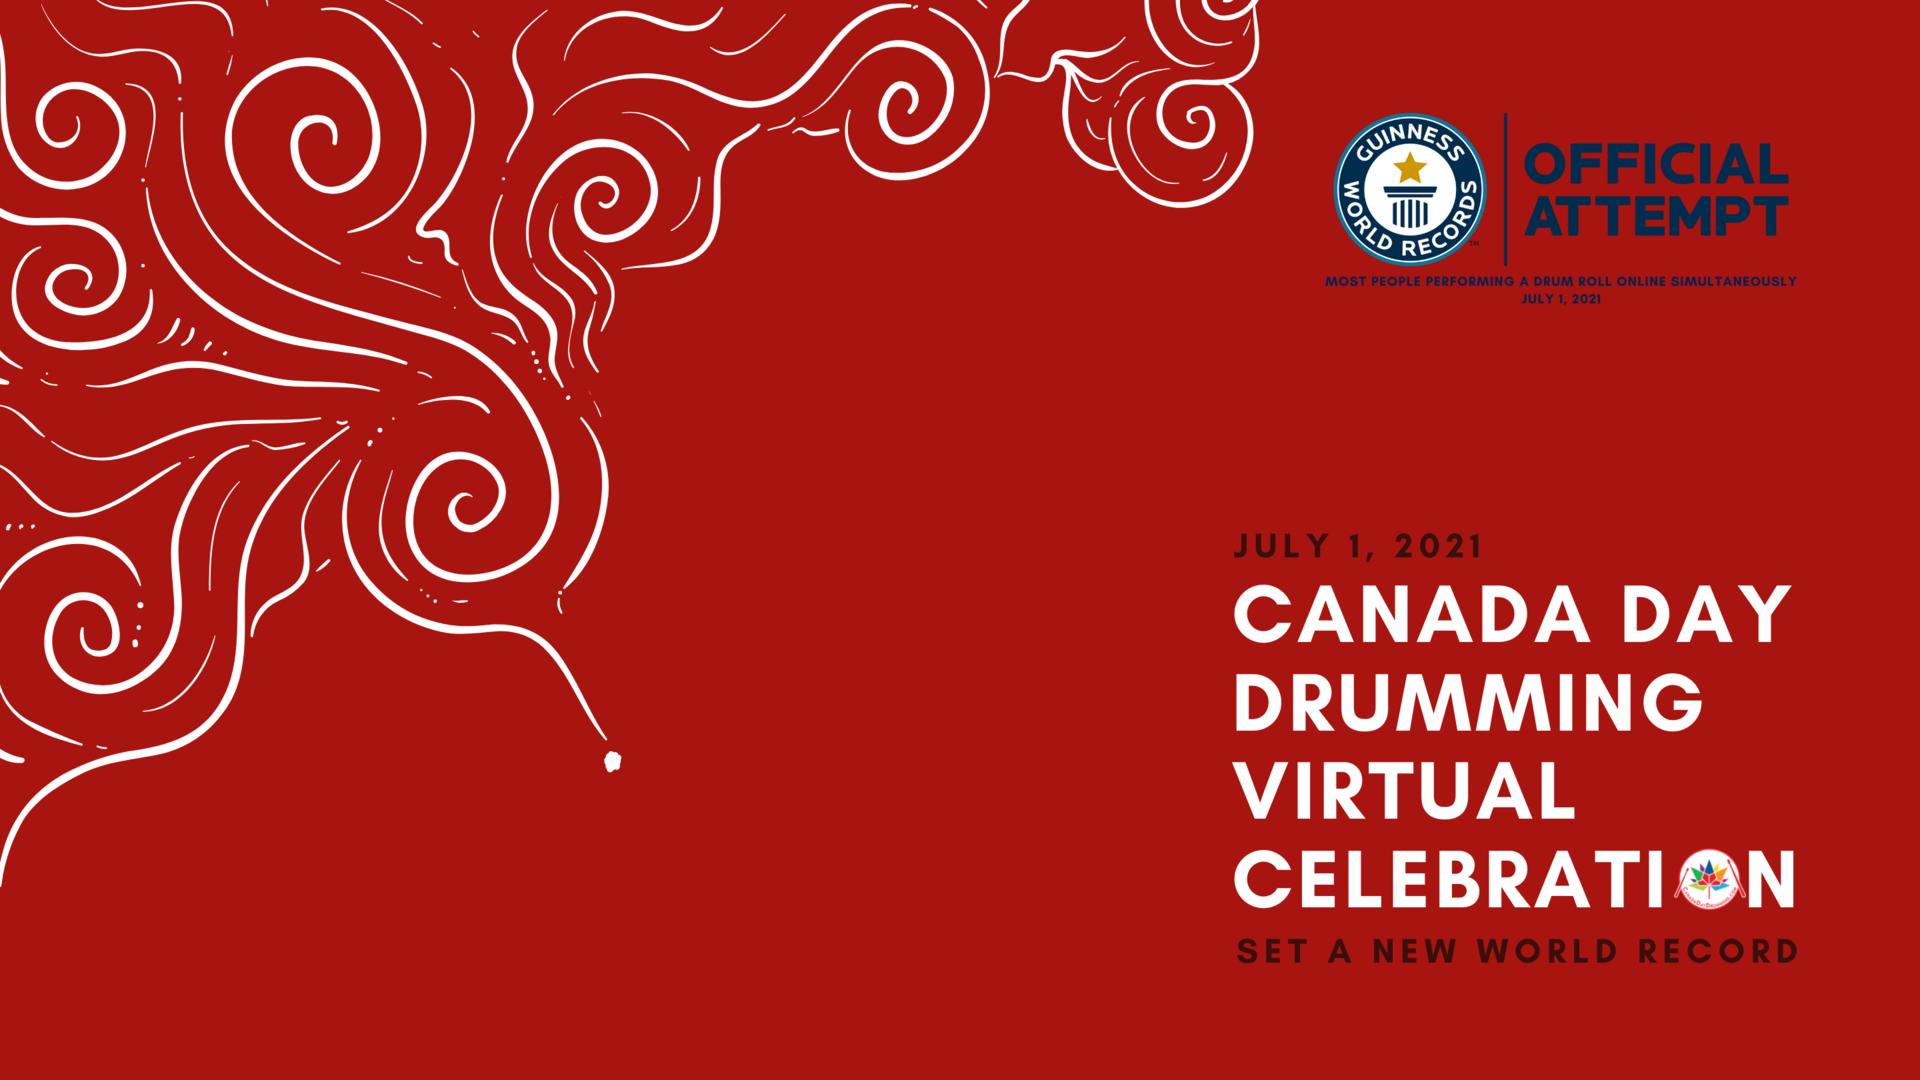 Canada Day Drumming Virtual Celebration 2021